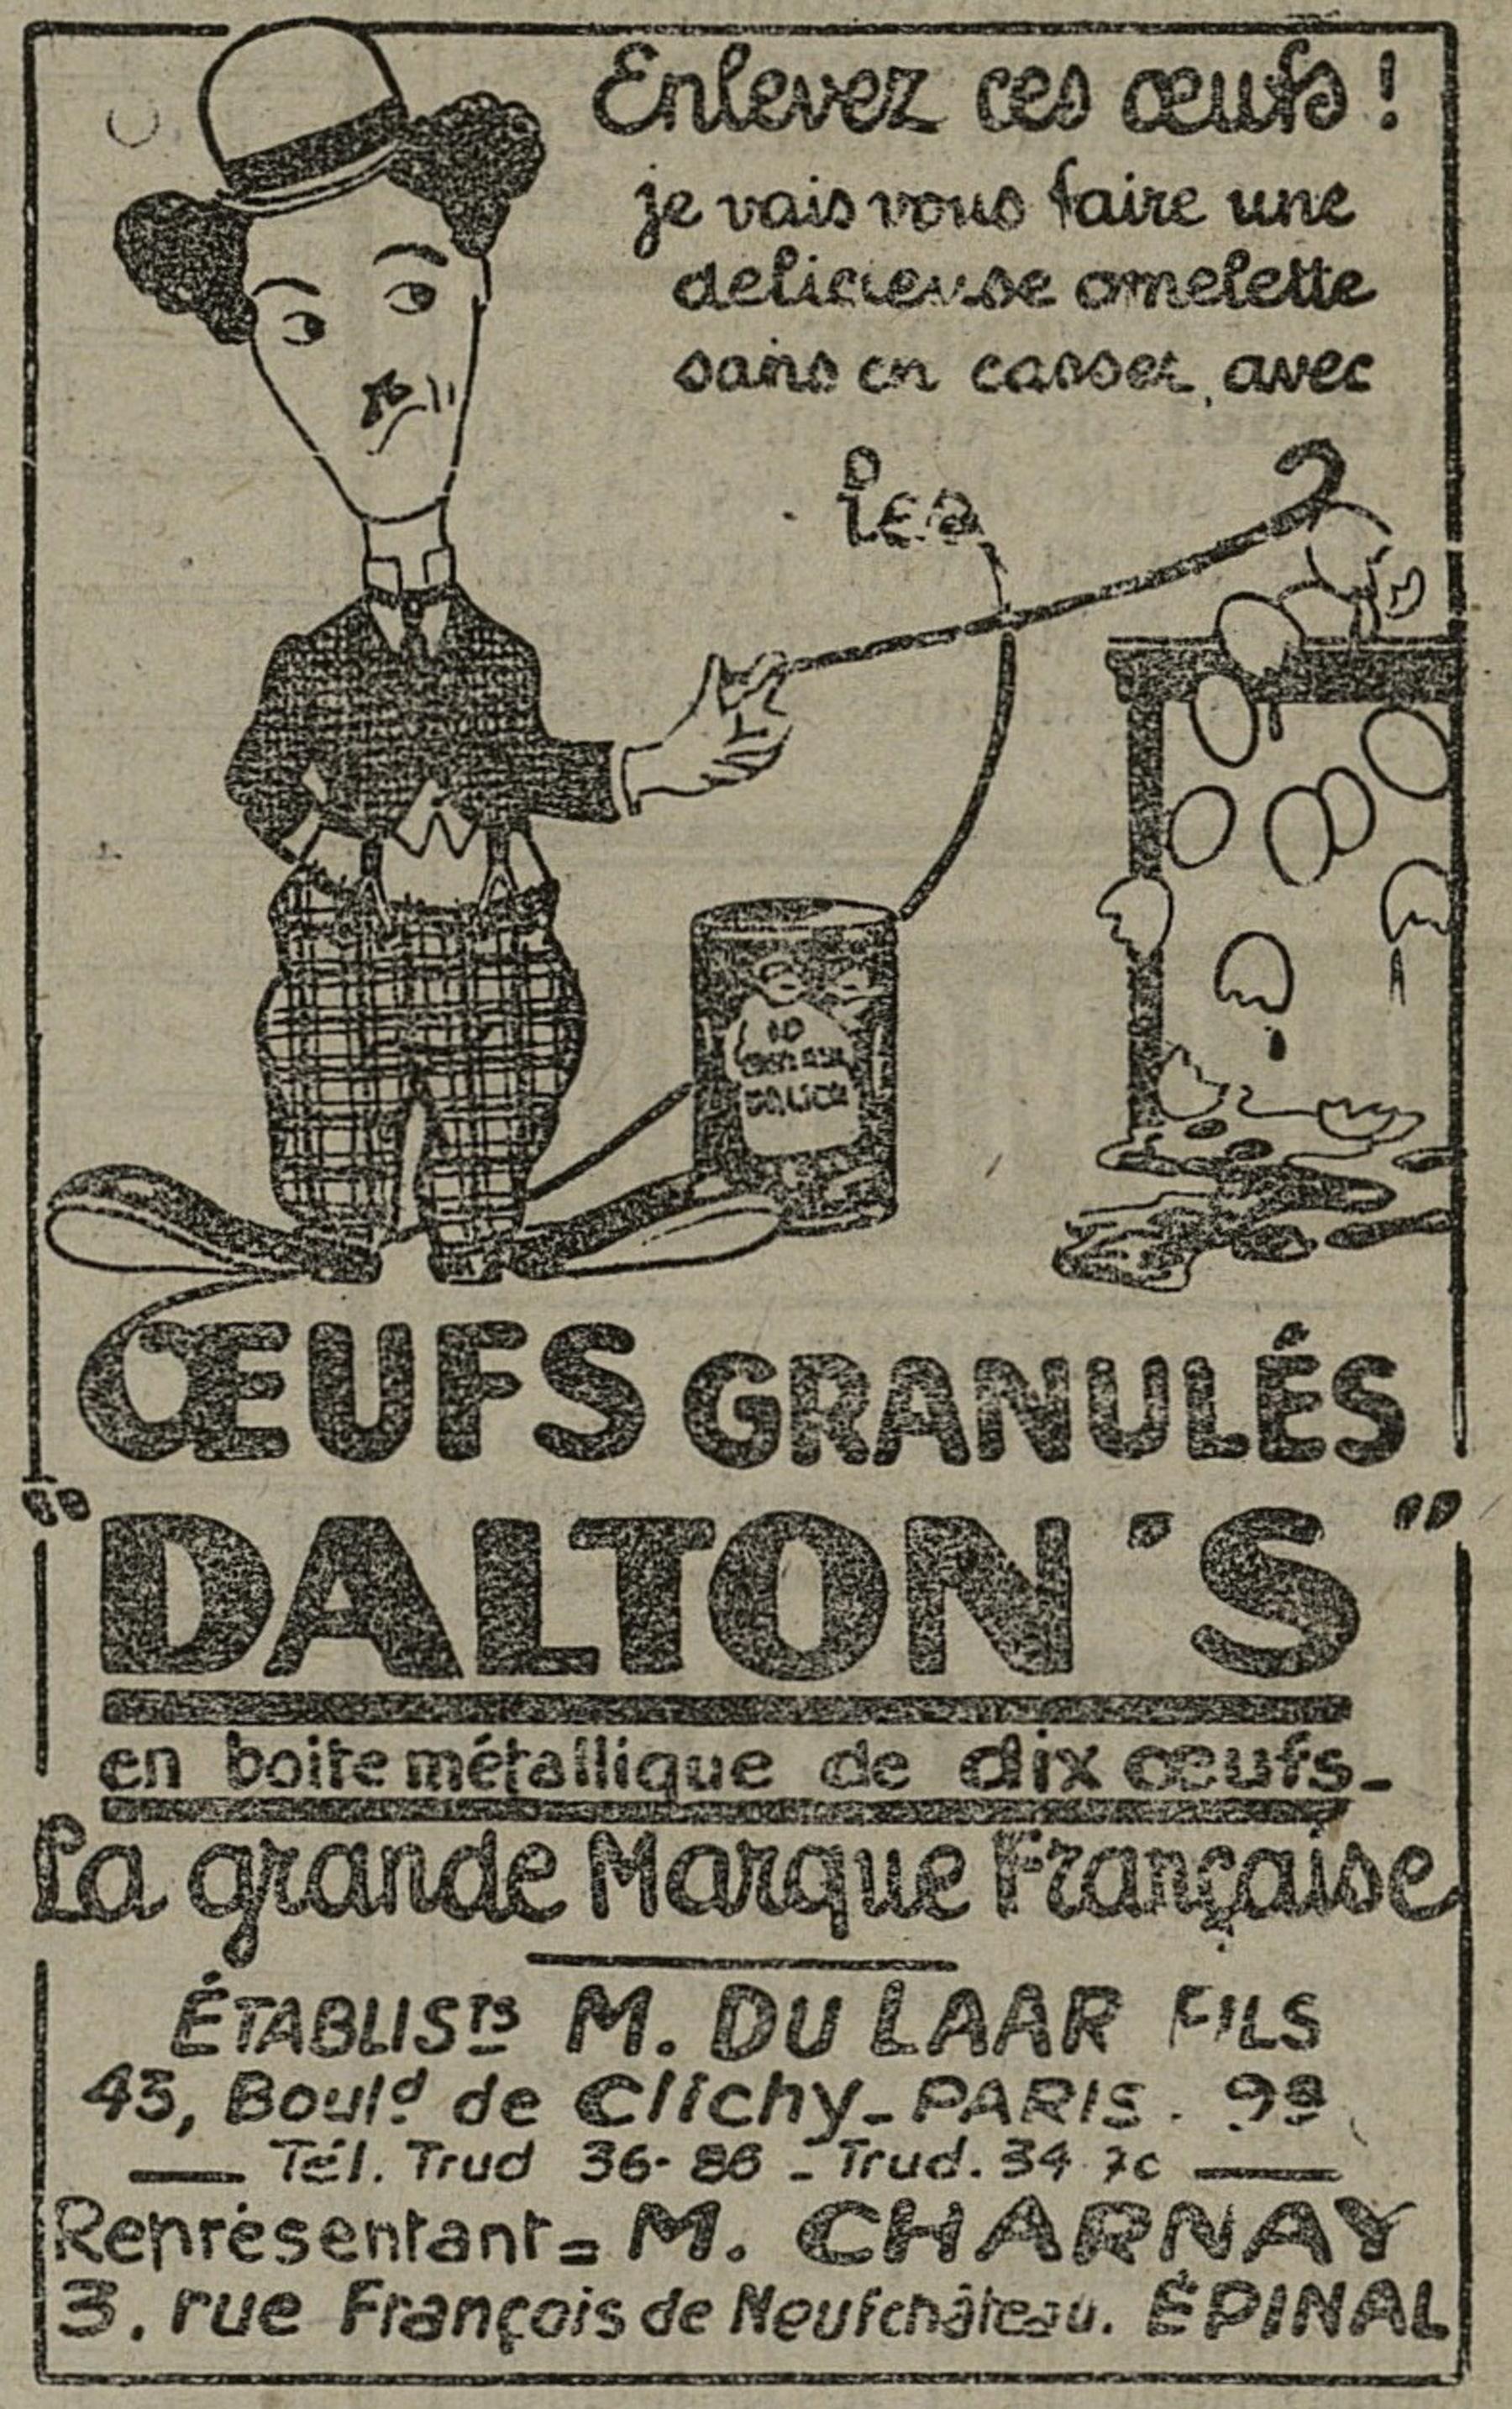 Contenu du Oeufs Dalton's